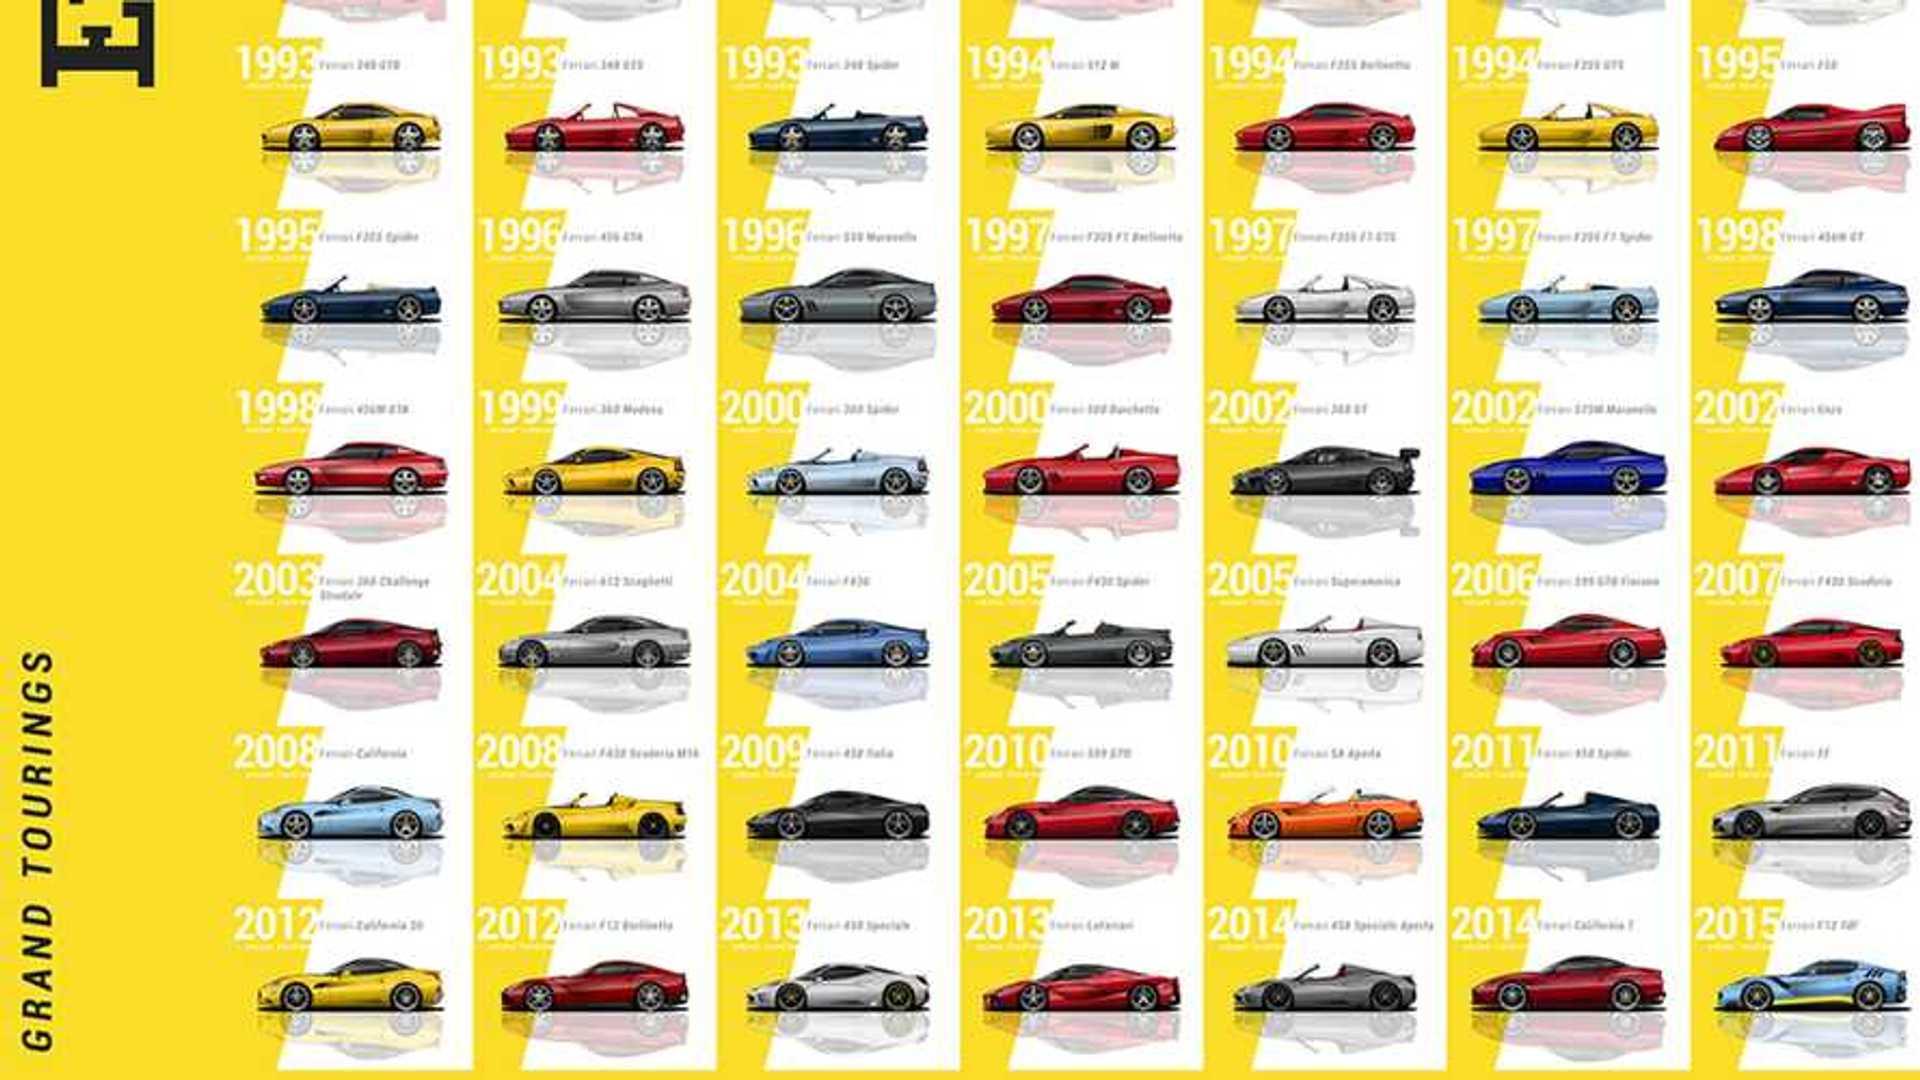 Morphing Through Every Ferrari Ever Made All 204